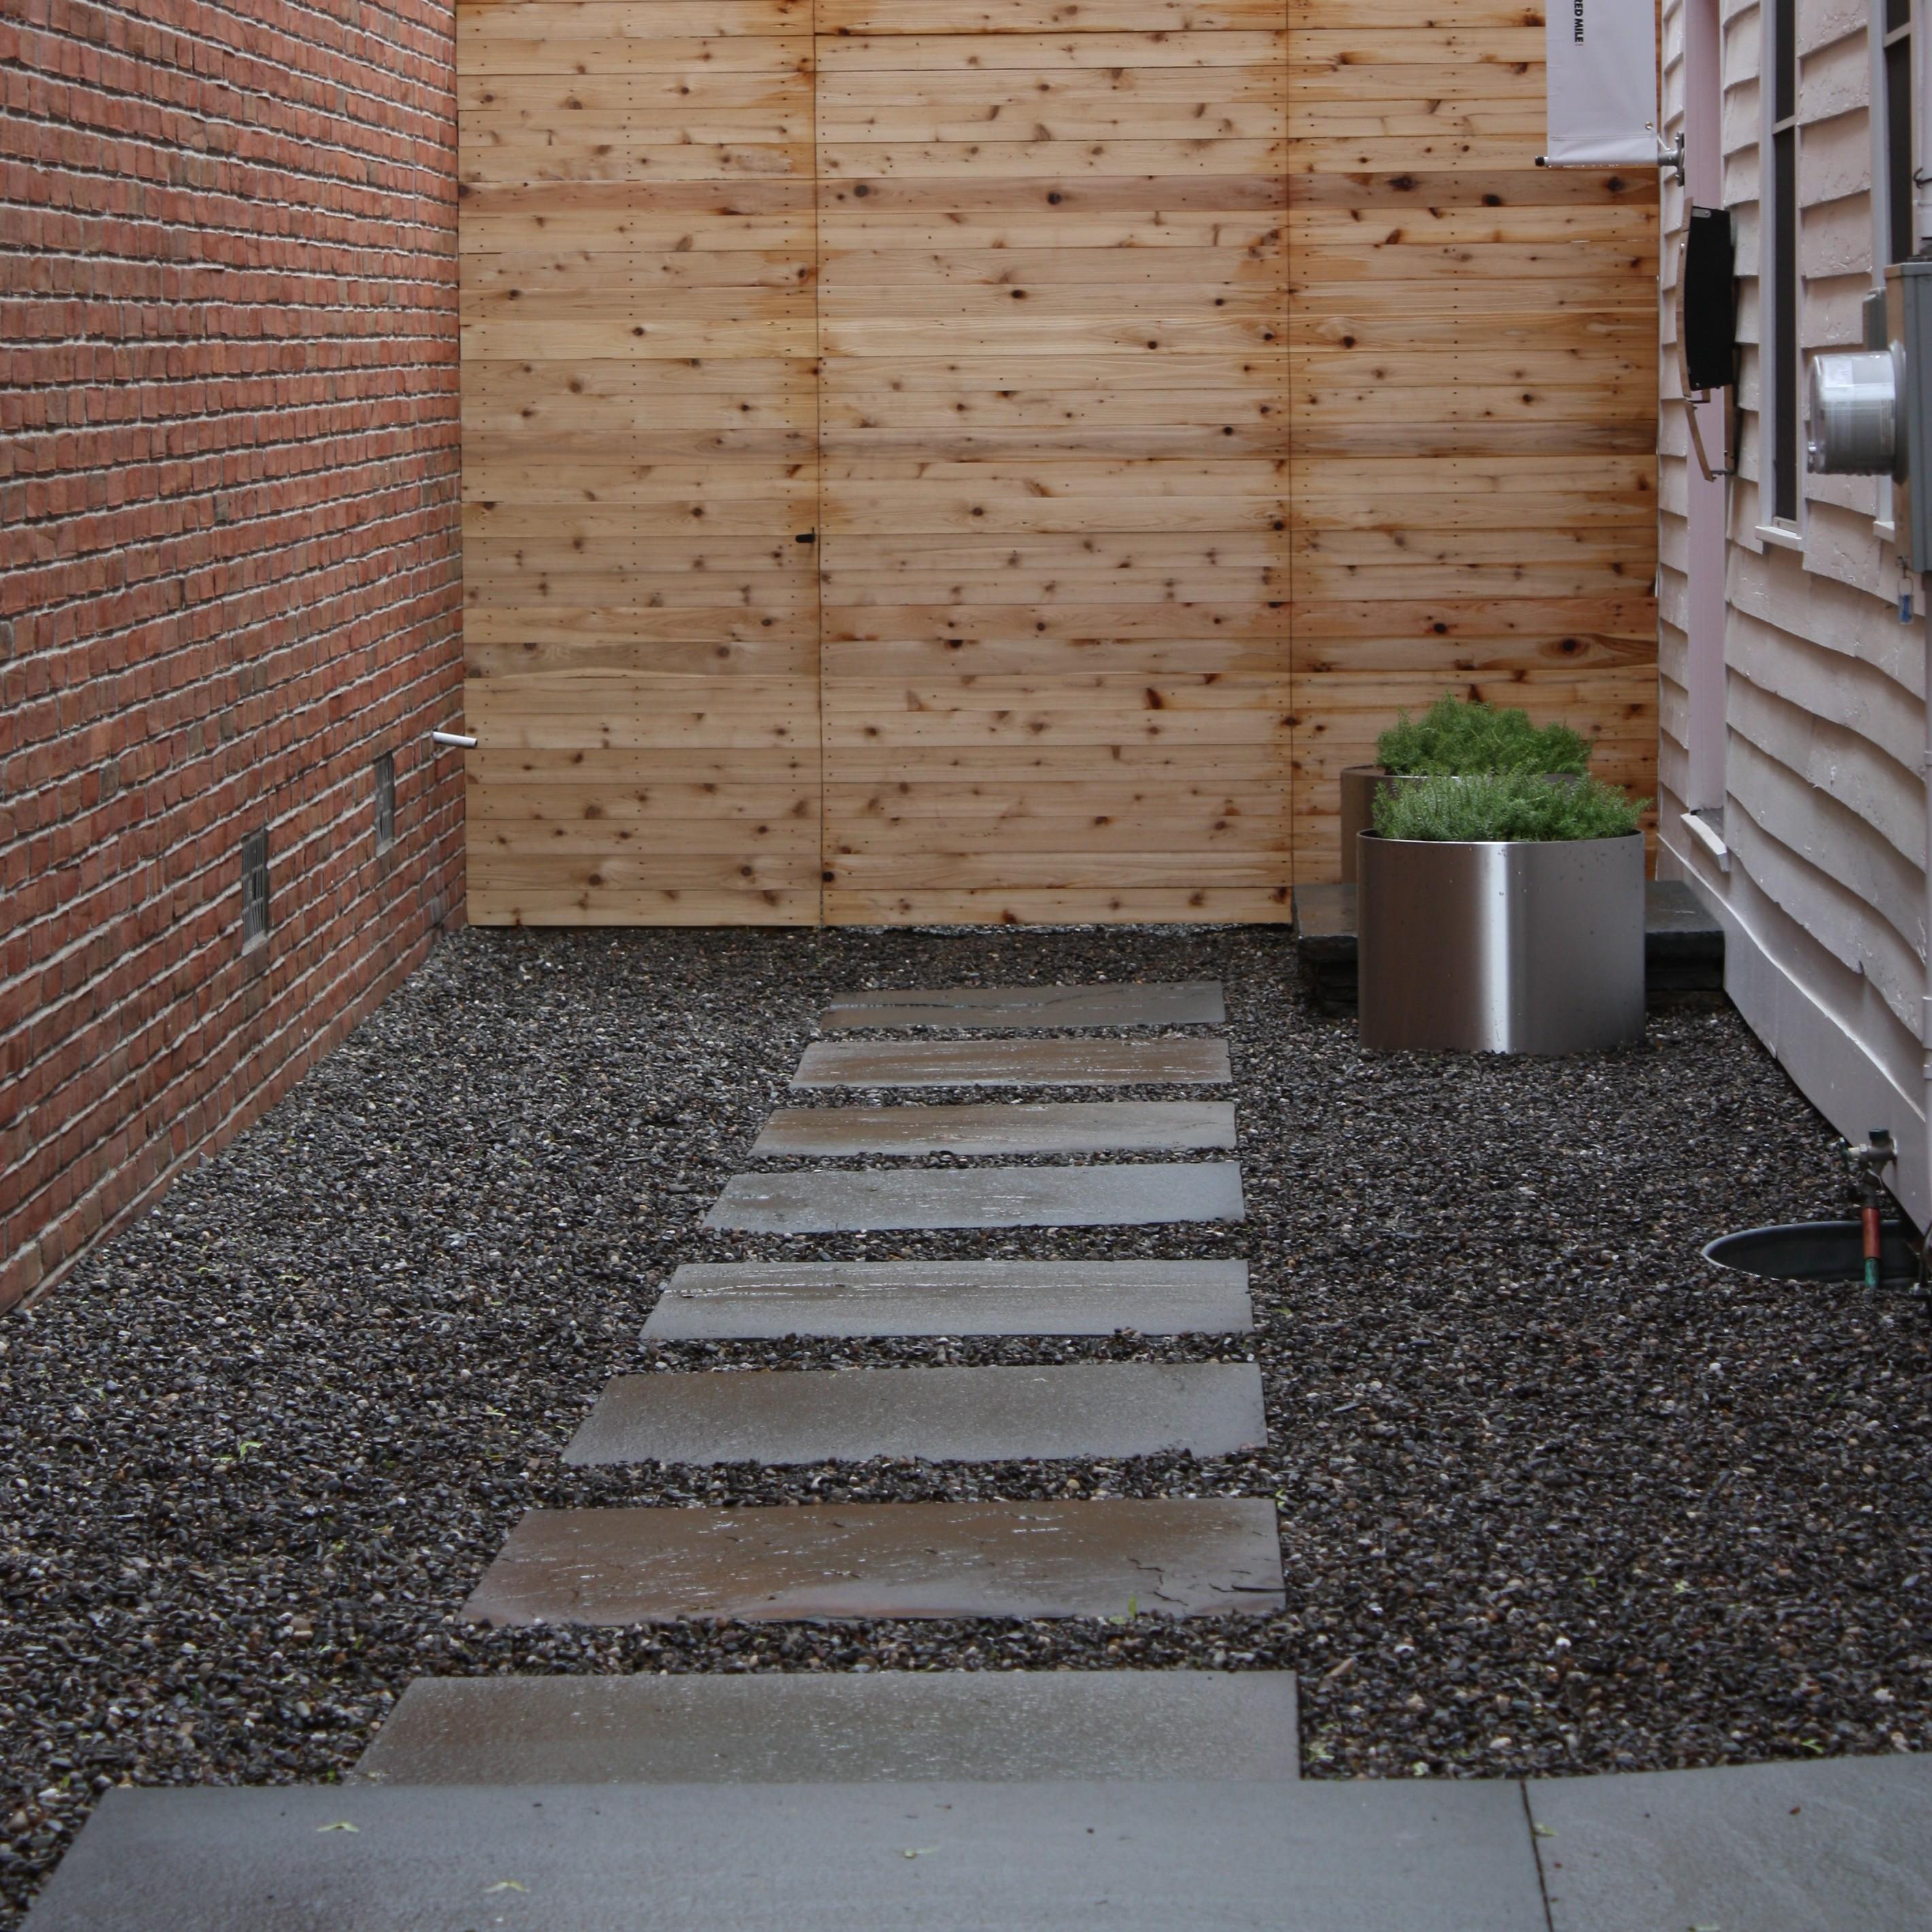 Stealing Ideas: Garden Paths | myMandC on Stepping Stone Patio Ideas  id=81201